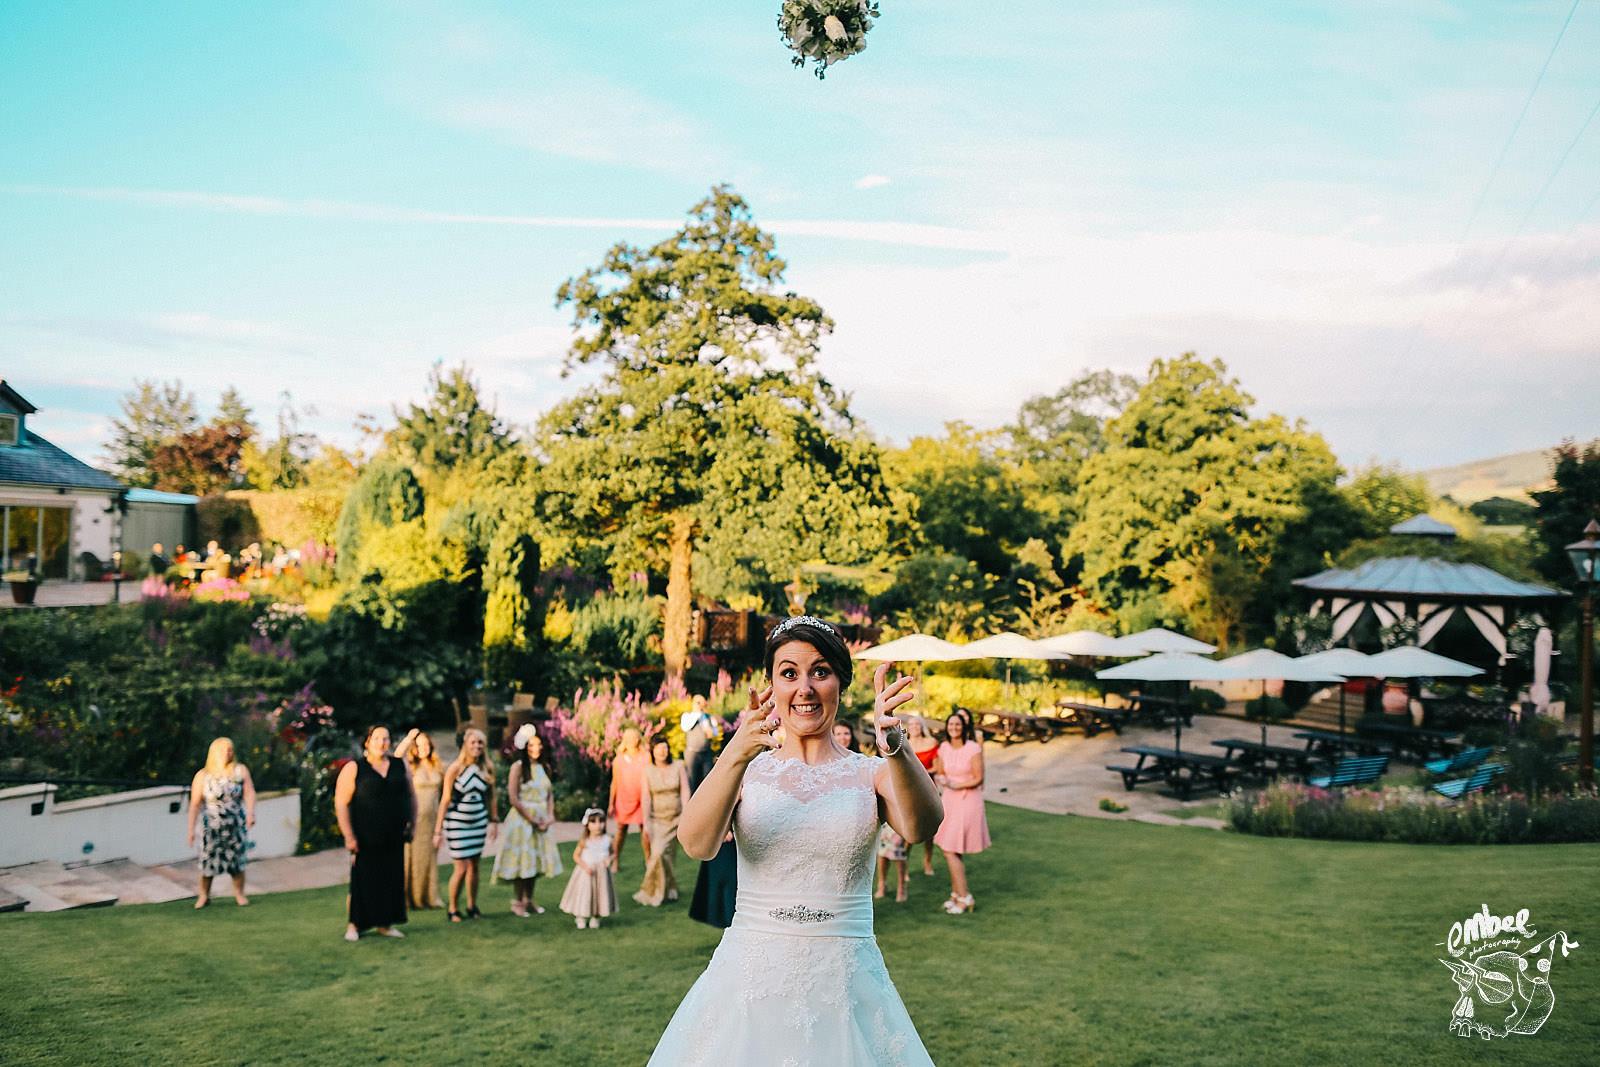 bride throws her wedding flower bouquet in the air